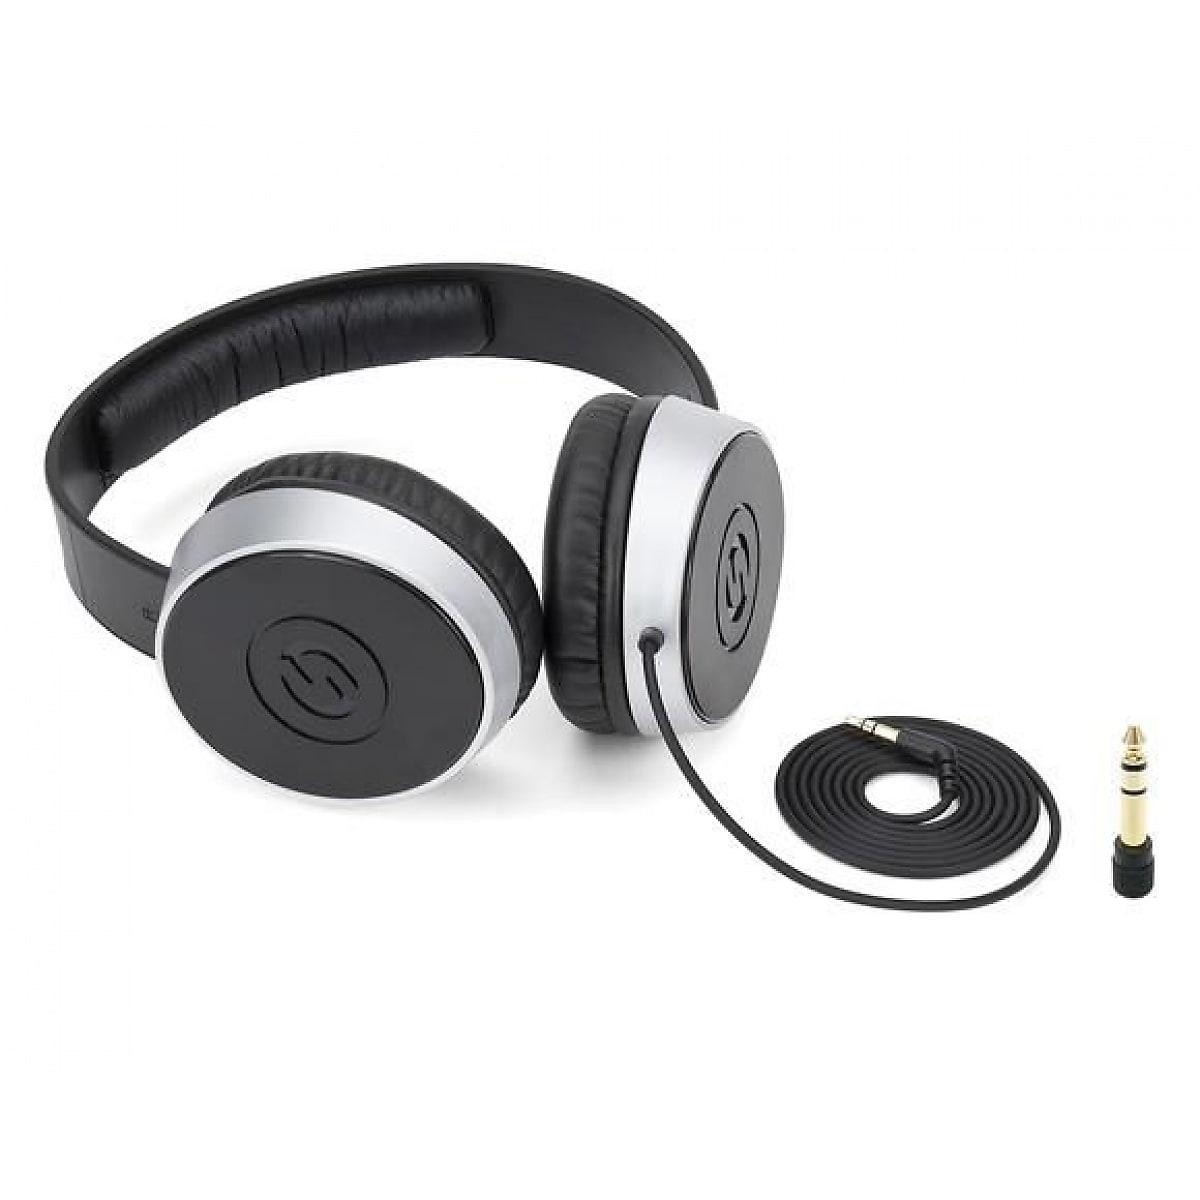 Samson SR550 Closed-Back Over-Ear Studio Headphones